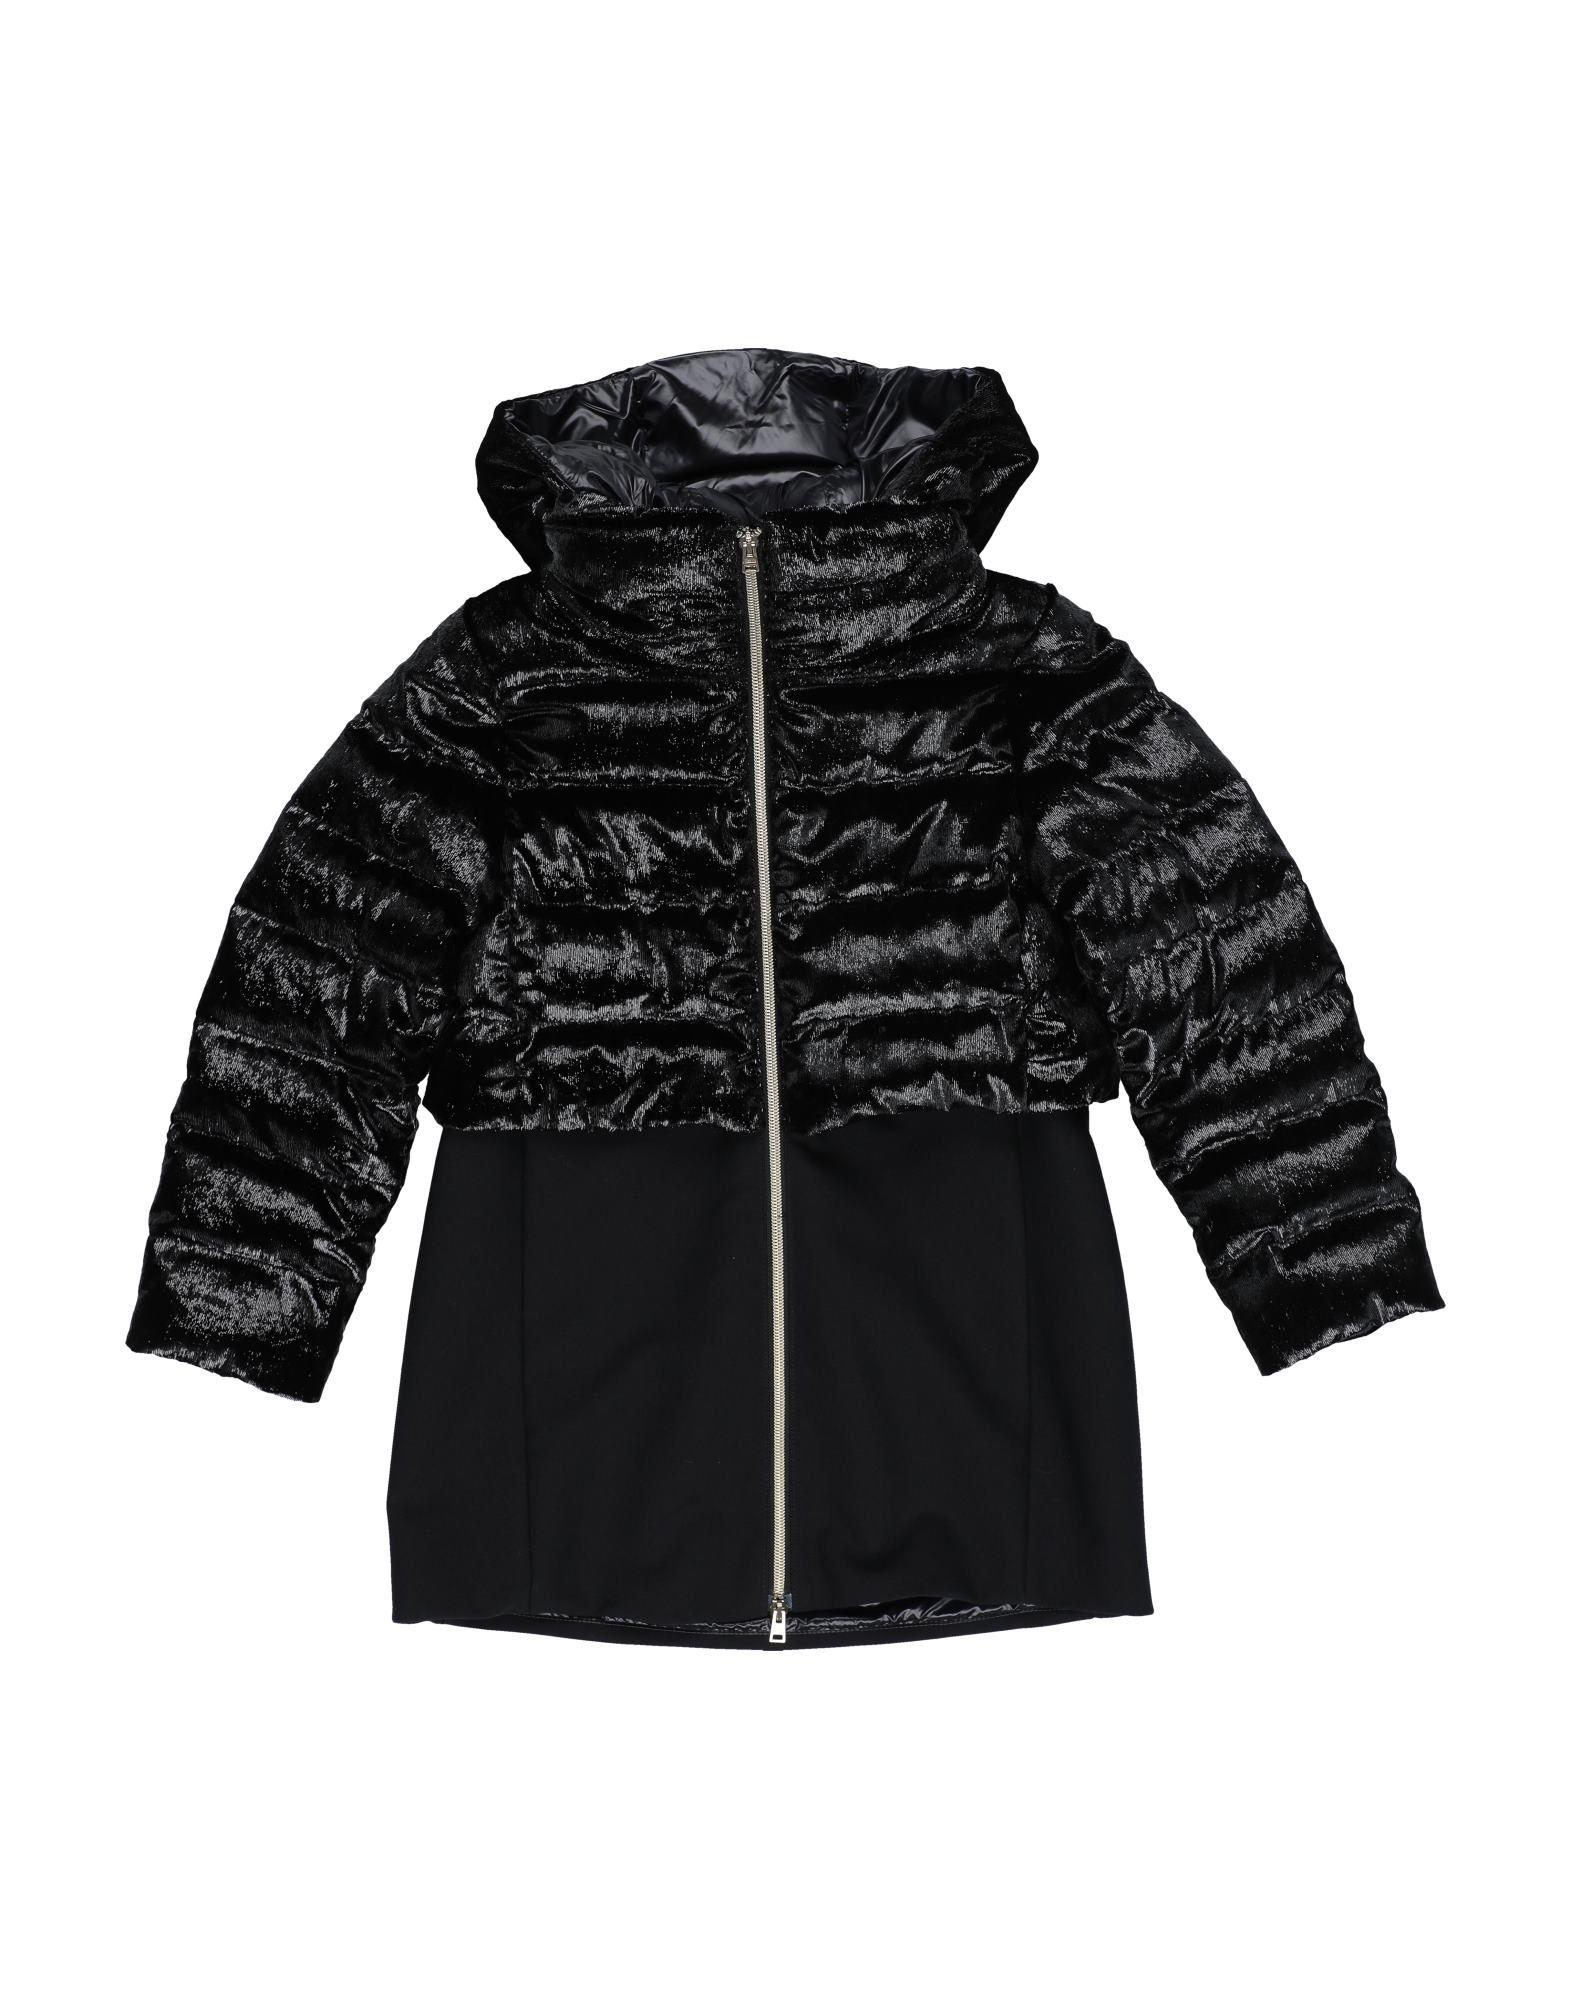 YOOX.COM(ユークス)《セール開催中》HERNO ガールズ 3-8 歳 合成繊維中綿アウター ブラック 8 ナイロン 100%